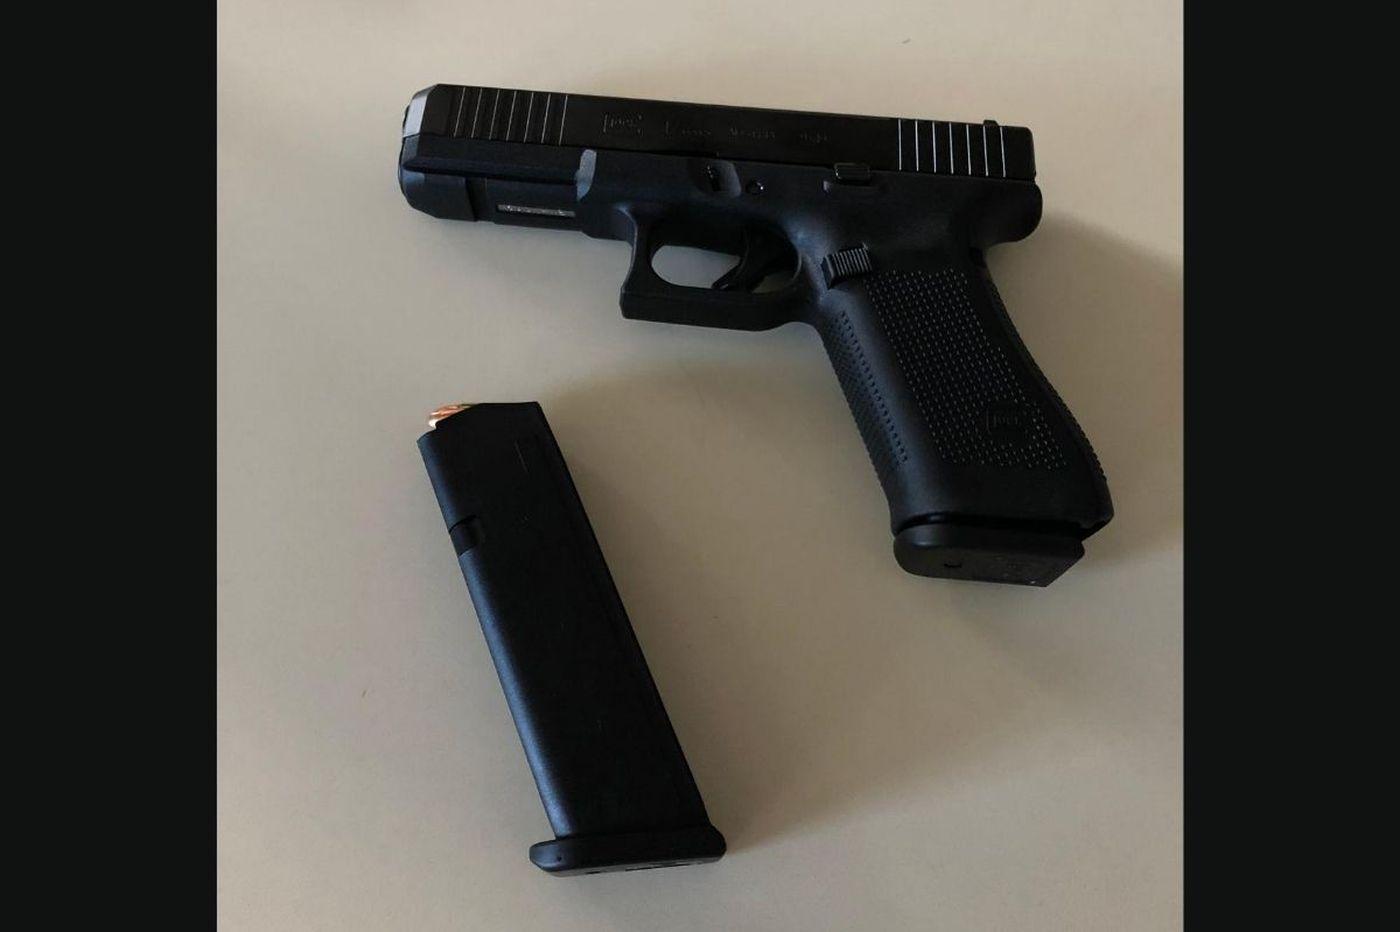 I bought my first gun because I no longer feel safe in America | Solomon Jones